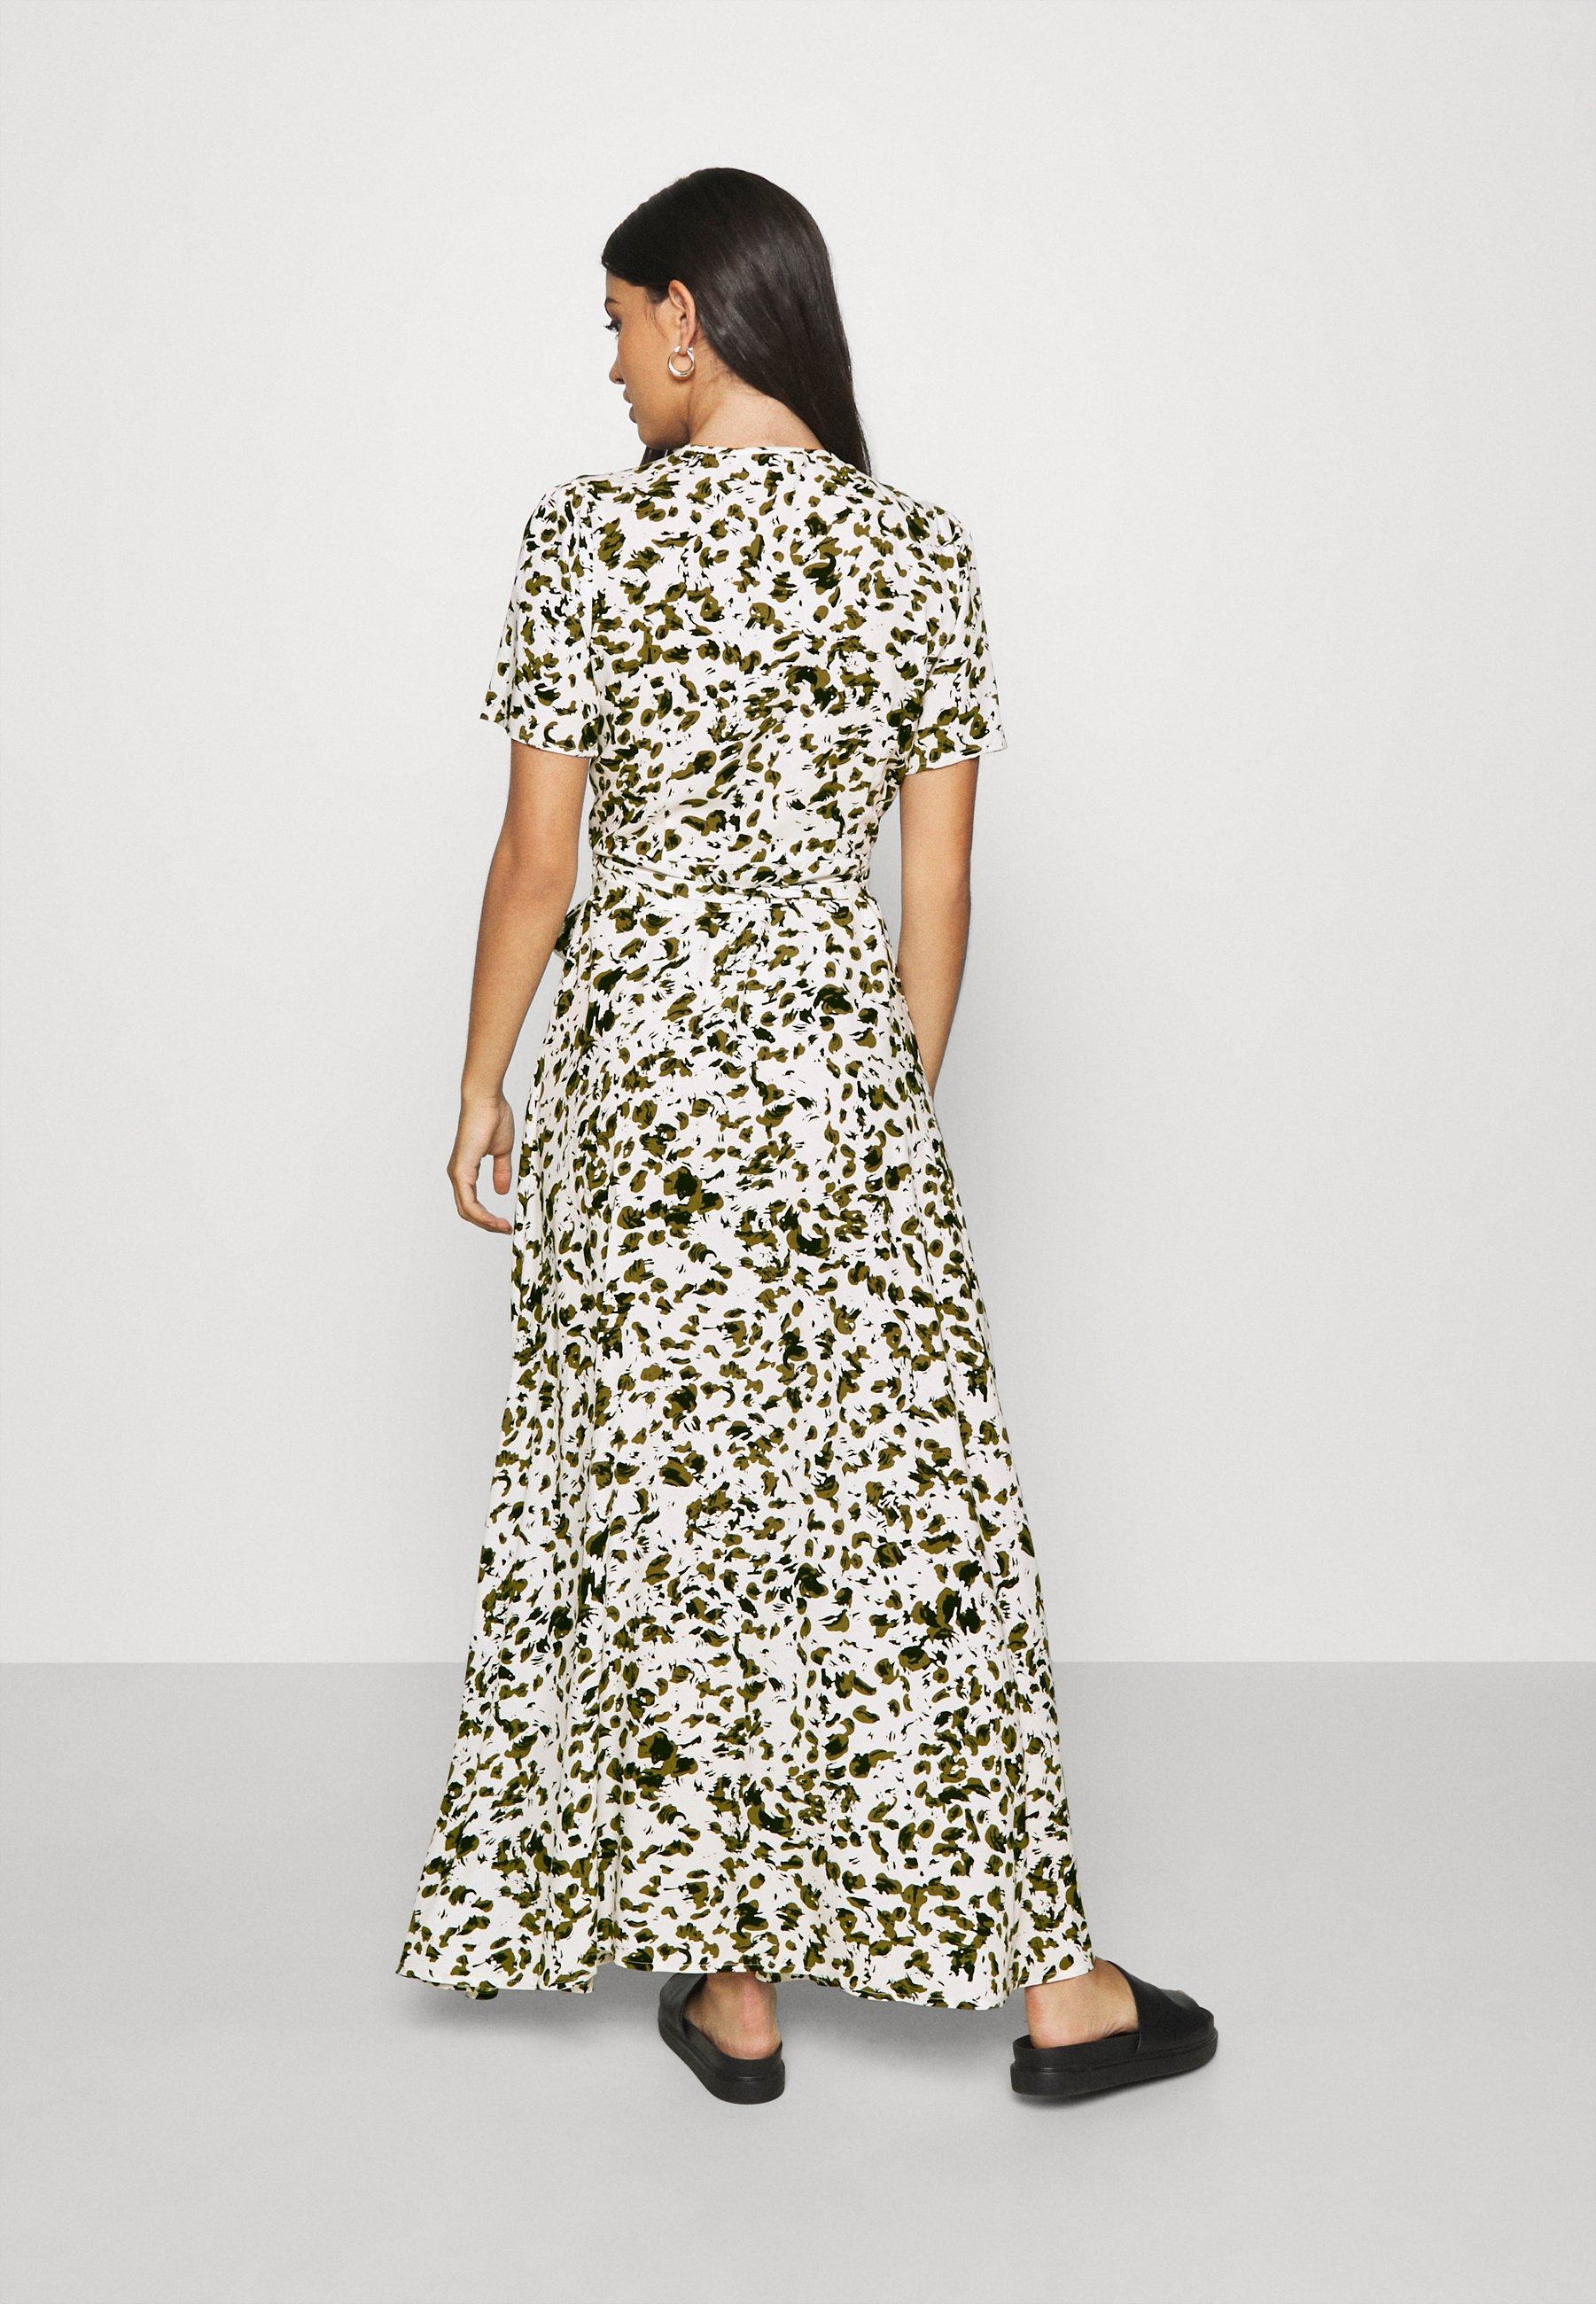 New Styles Women's Clothing Minimum ELASTICA Maxi dress broken white qj5a55lcn